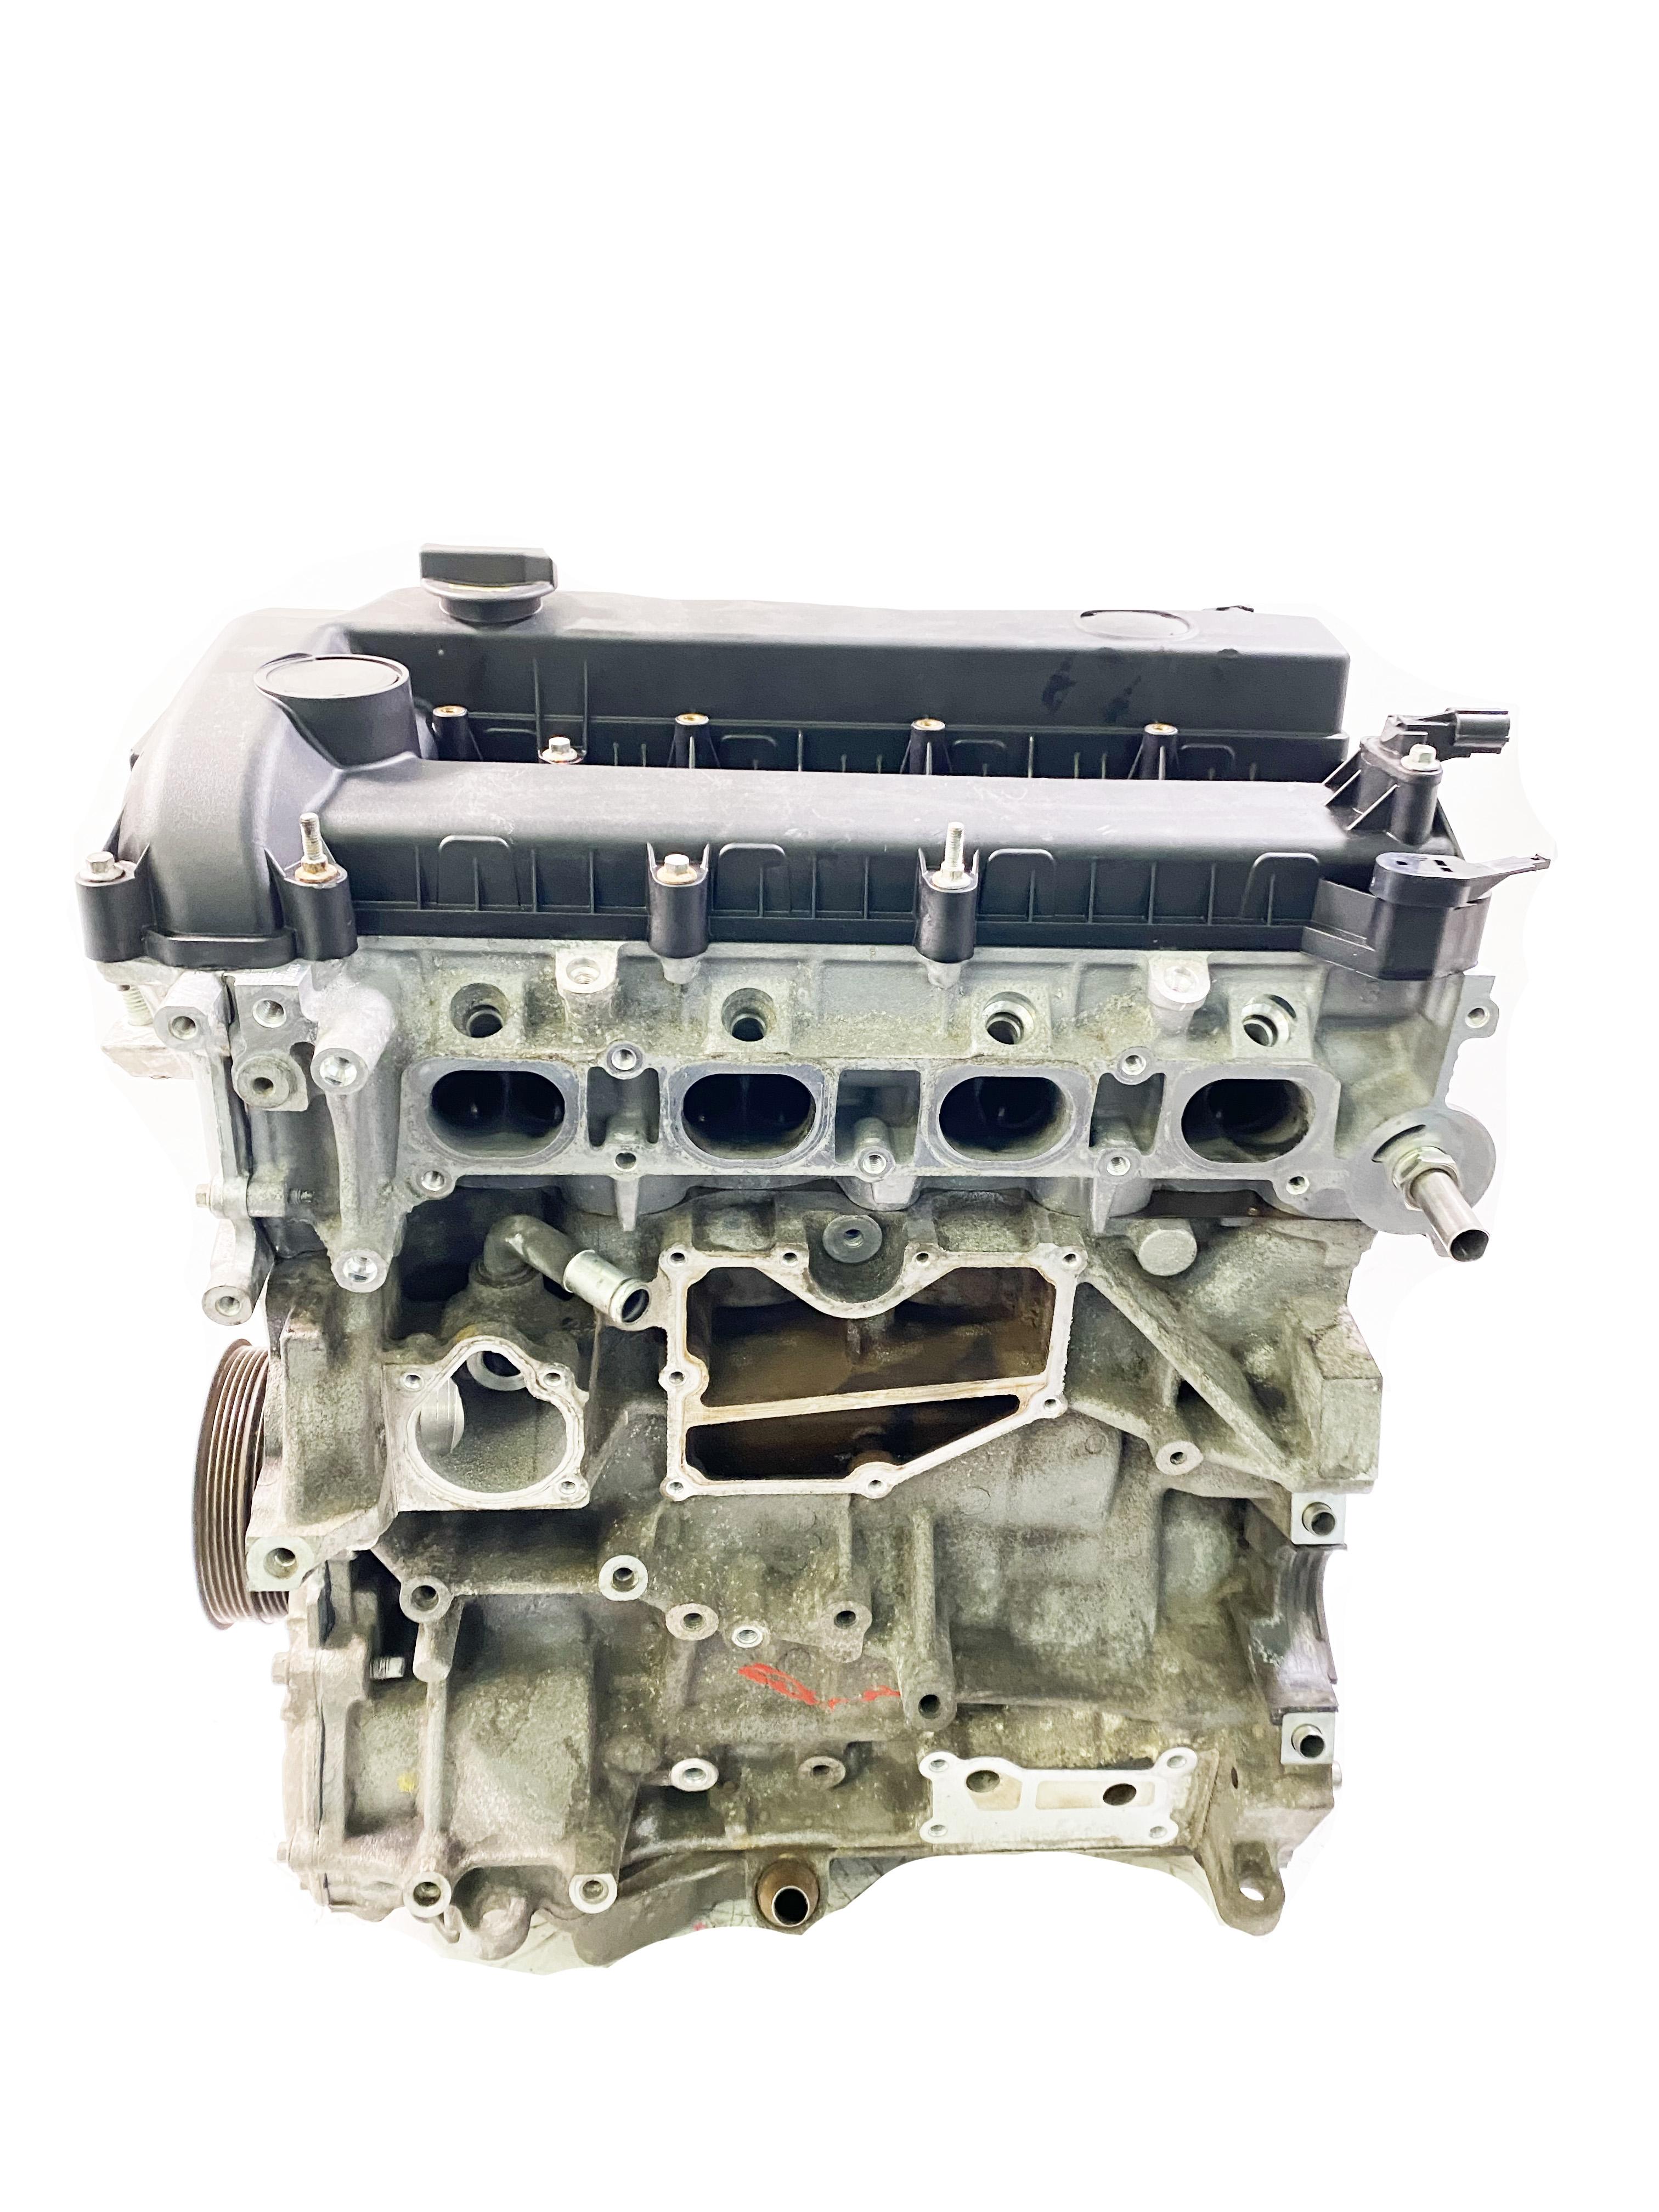 Motor 2007 für Mazda 5 CR19 CR 1,8 Benzin L8 L823 116 PS